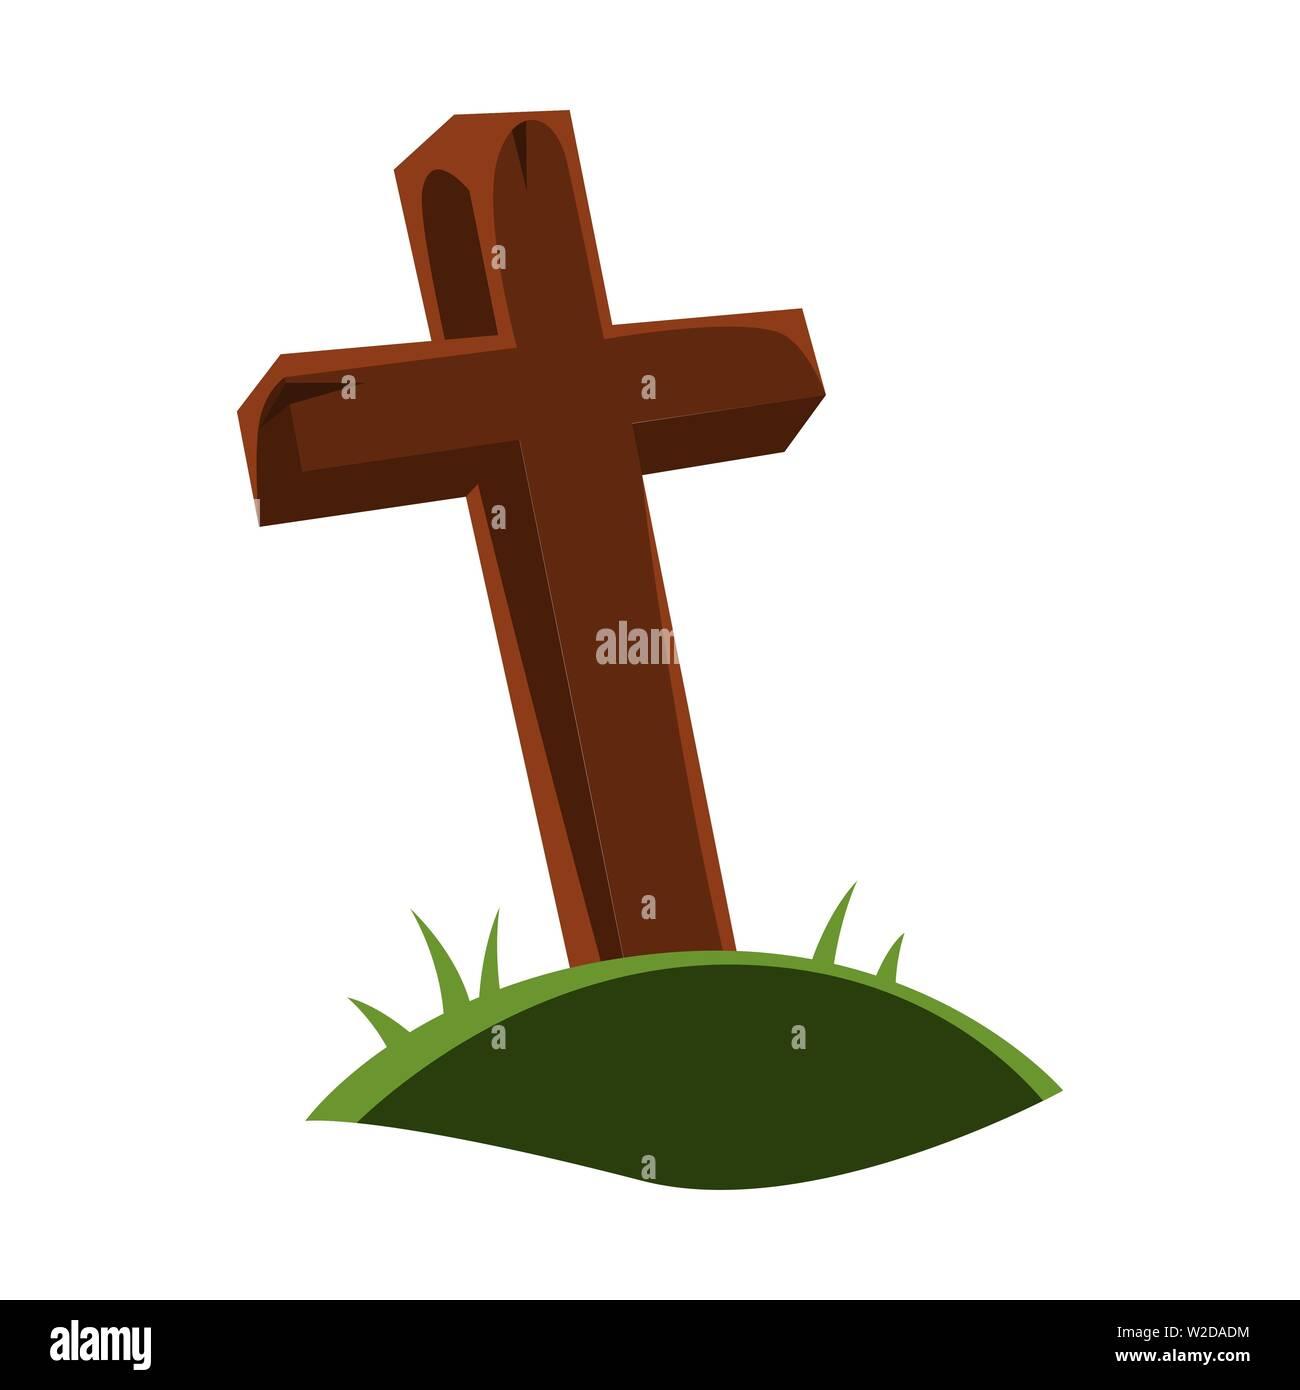 Happy halloween illustration of grave cross. - Stock Vector